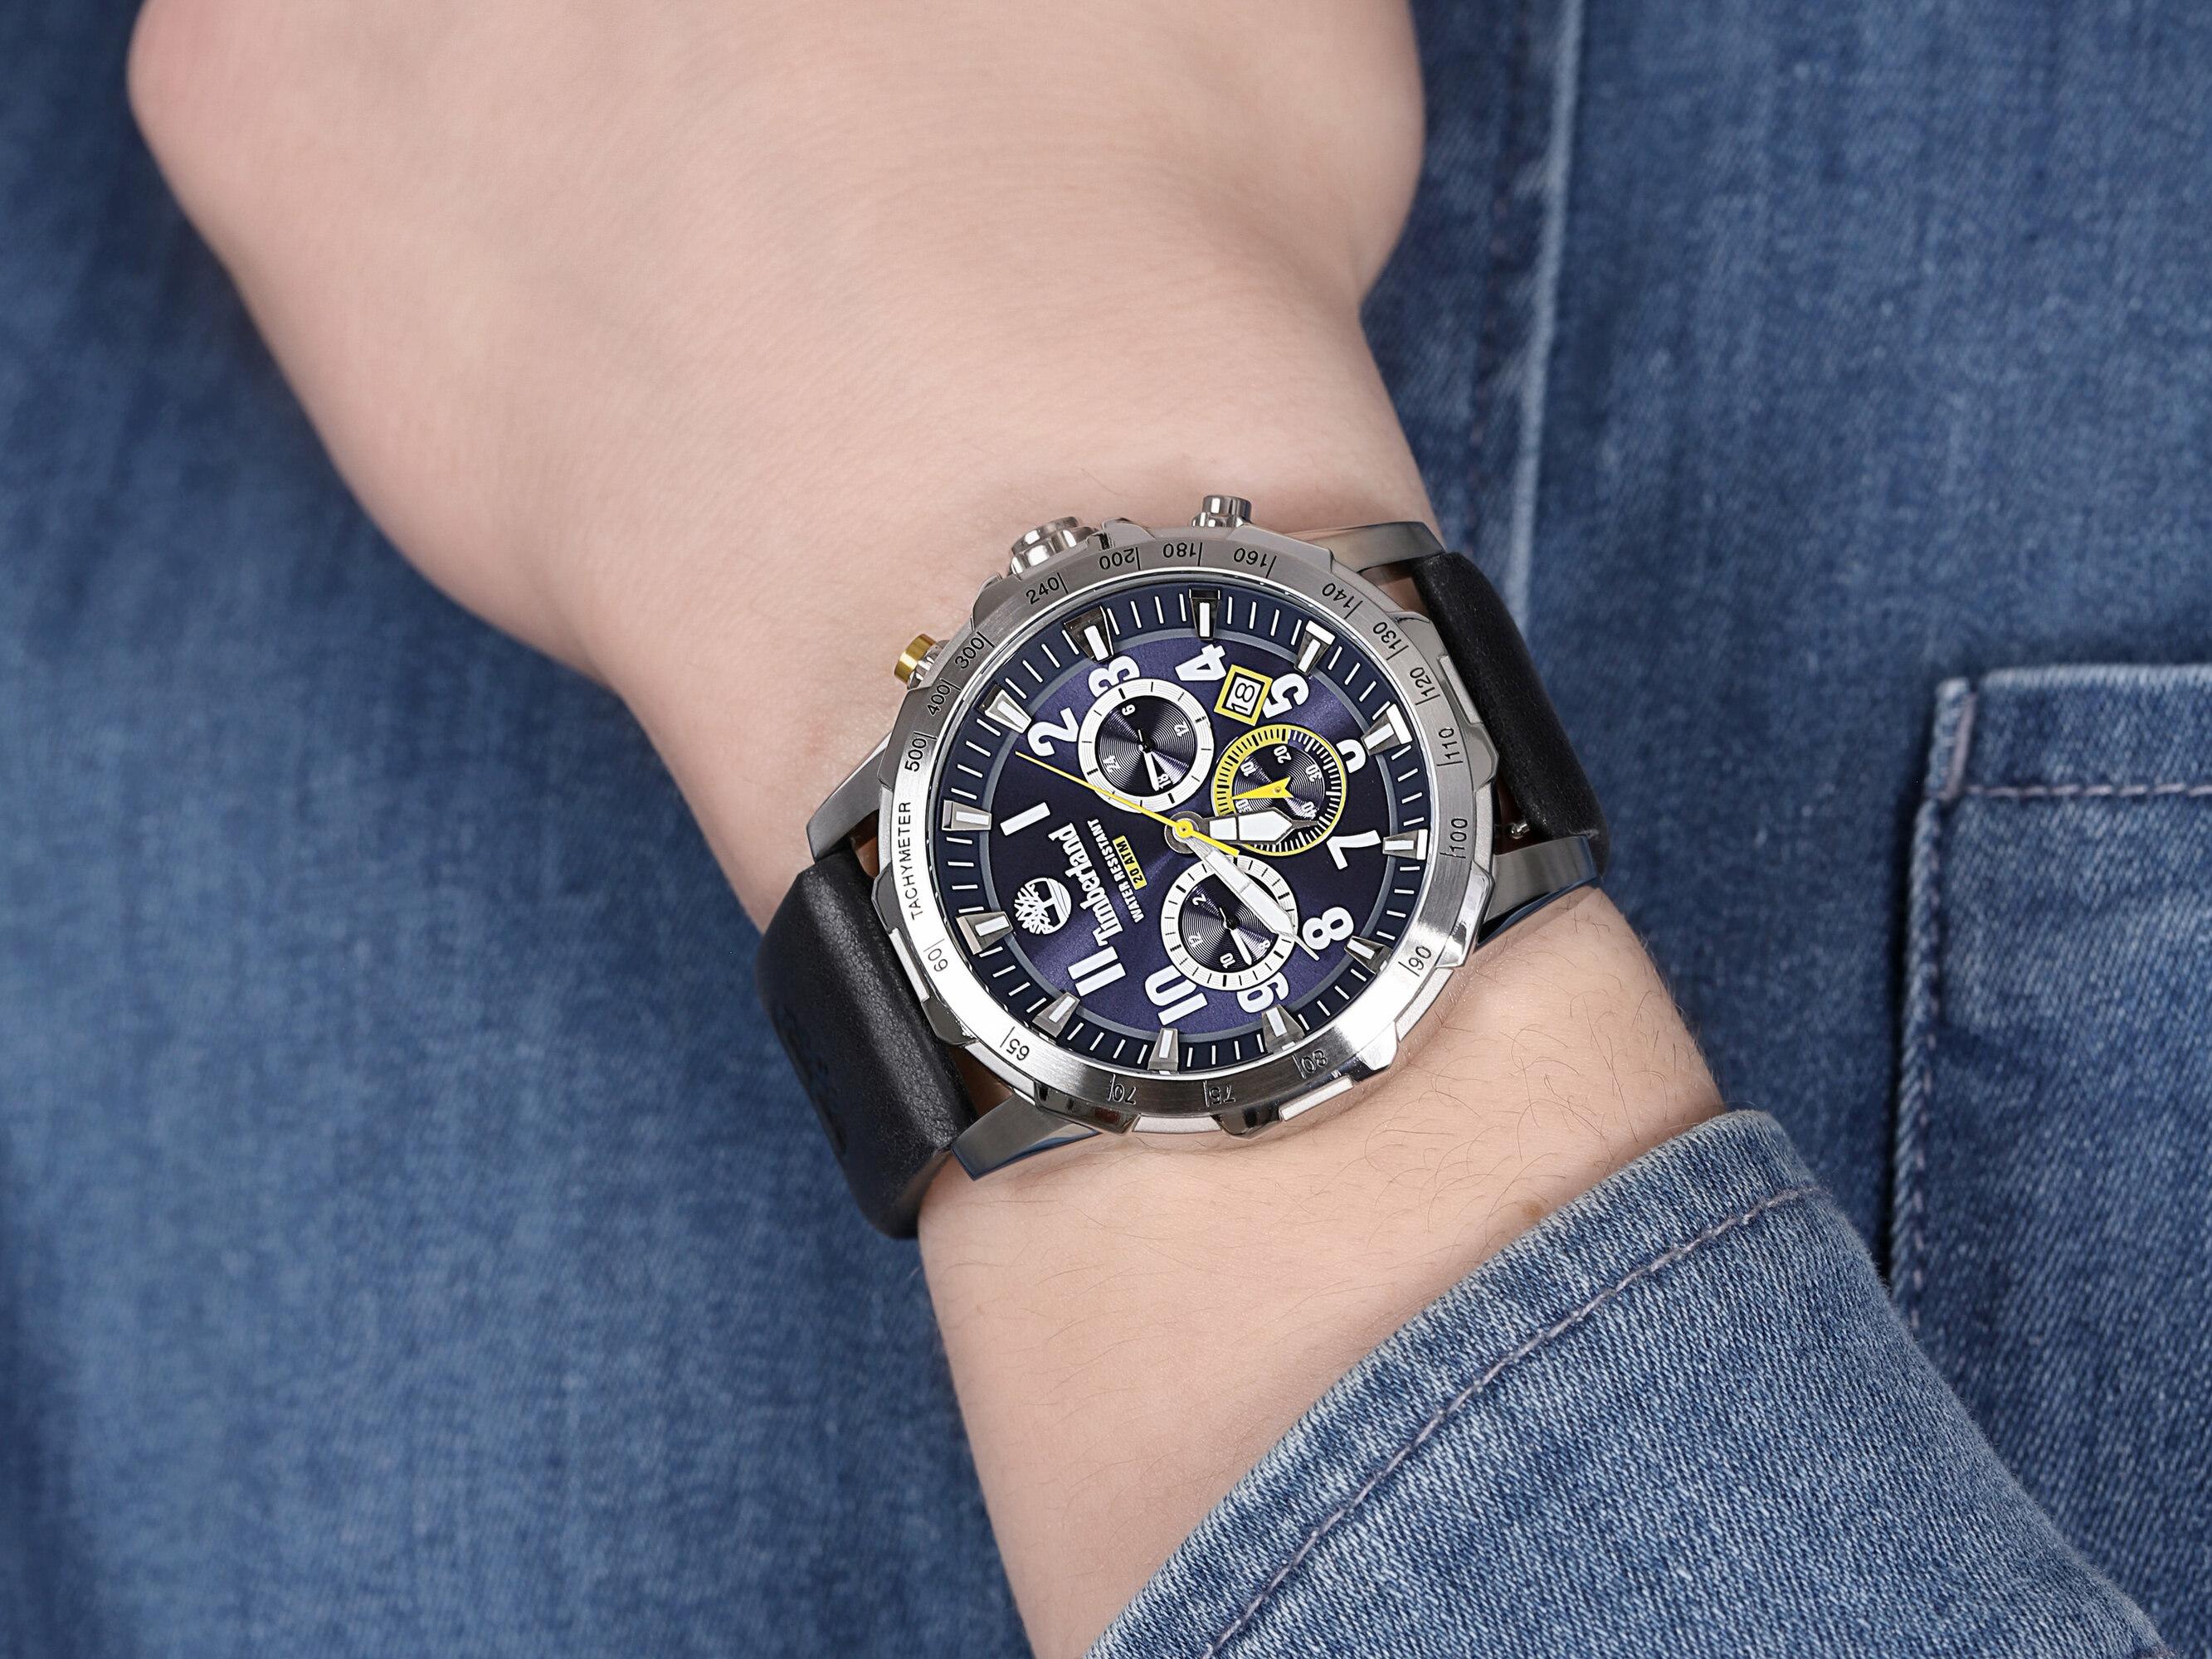 zegarek Timberland TBL.15547JS-03AS WESTFORD męski z tachometr Westford